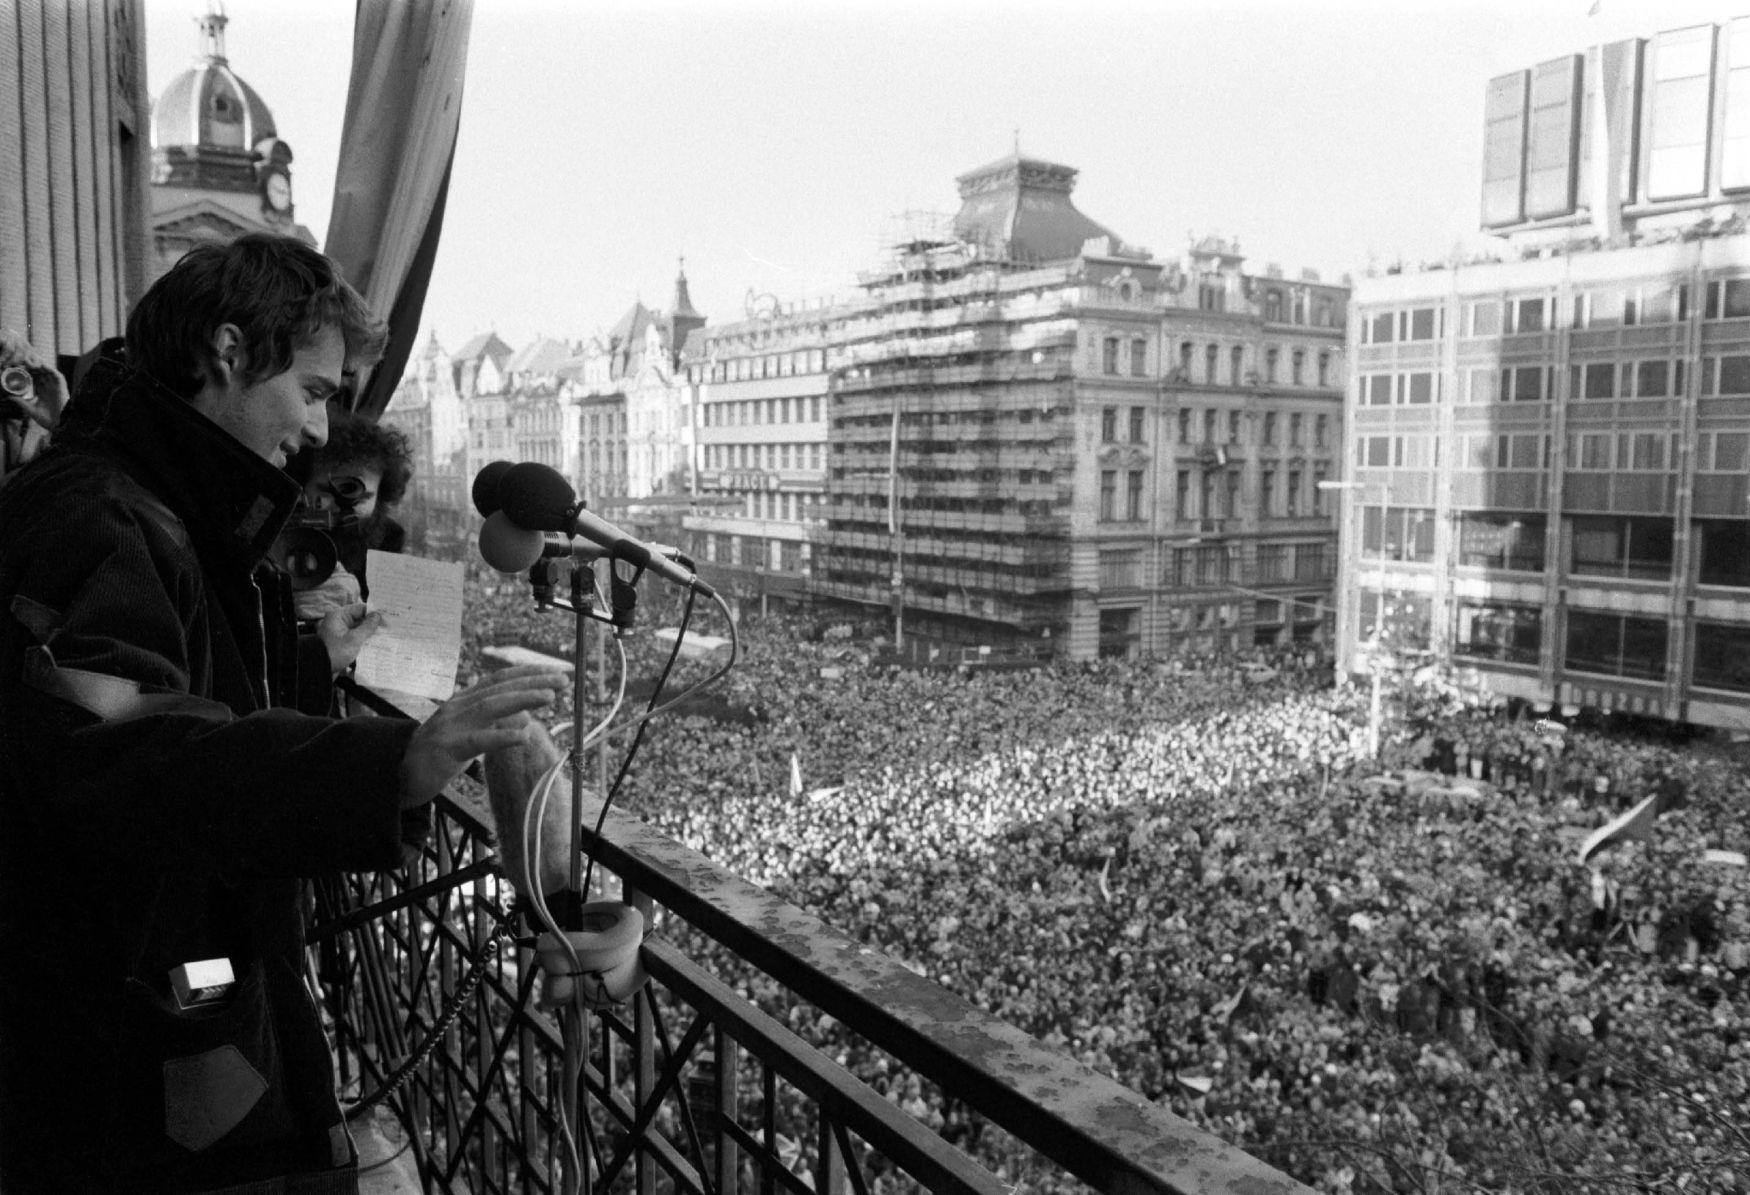 Výsledek obrázku pro foto pánek 1989